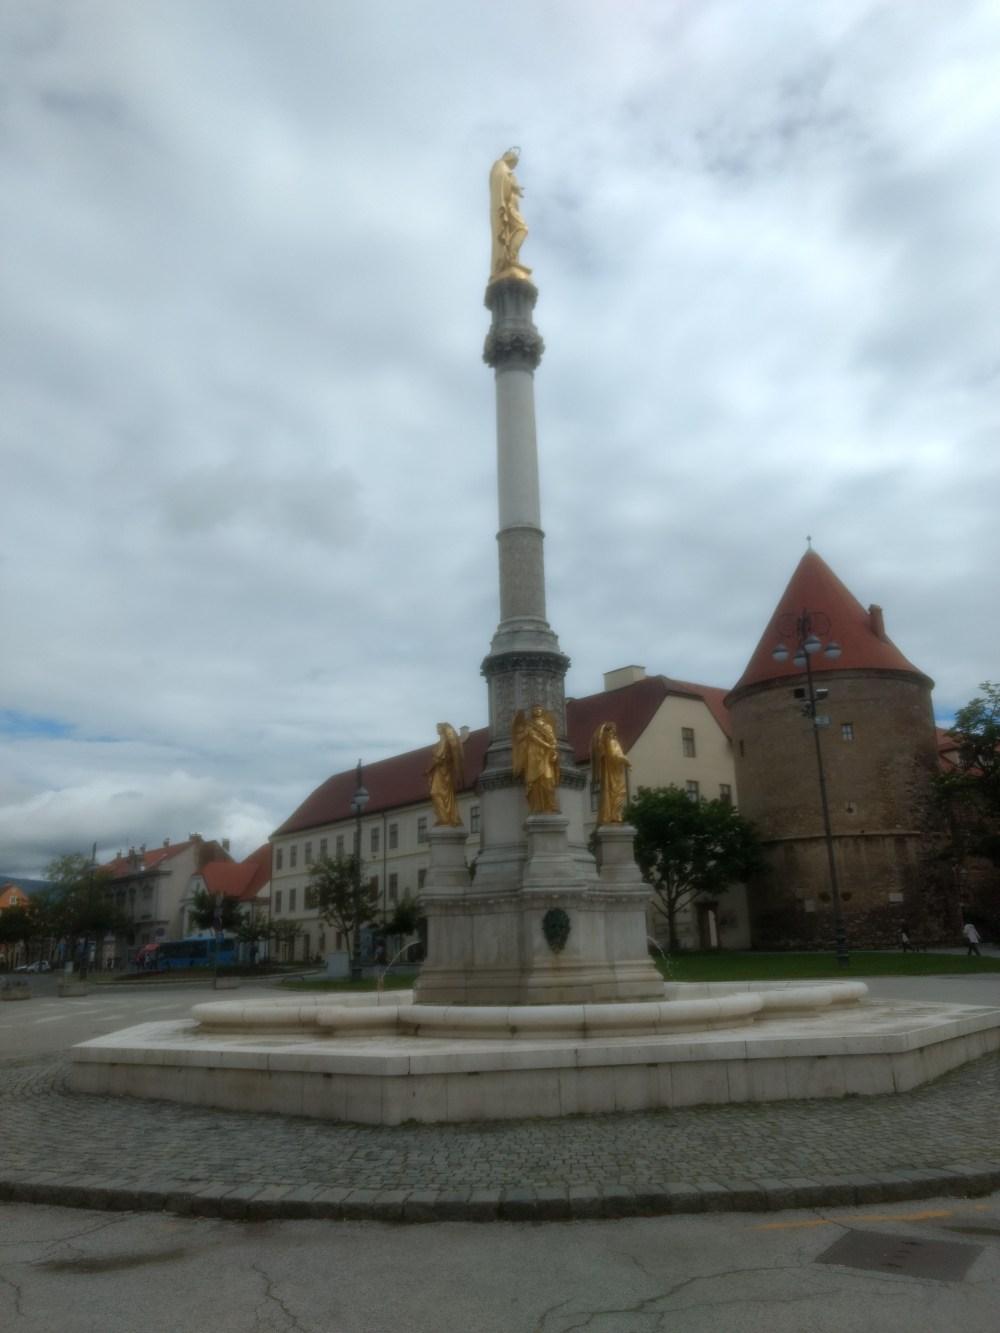 Kaptol Square, Zagreb, Croatia